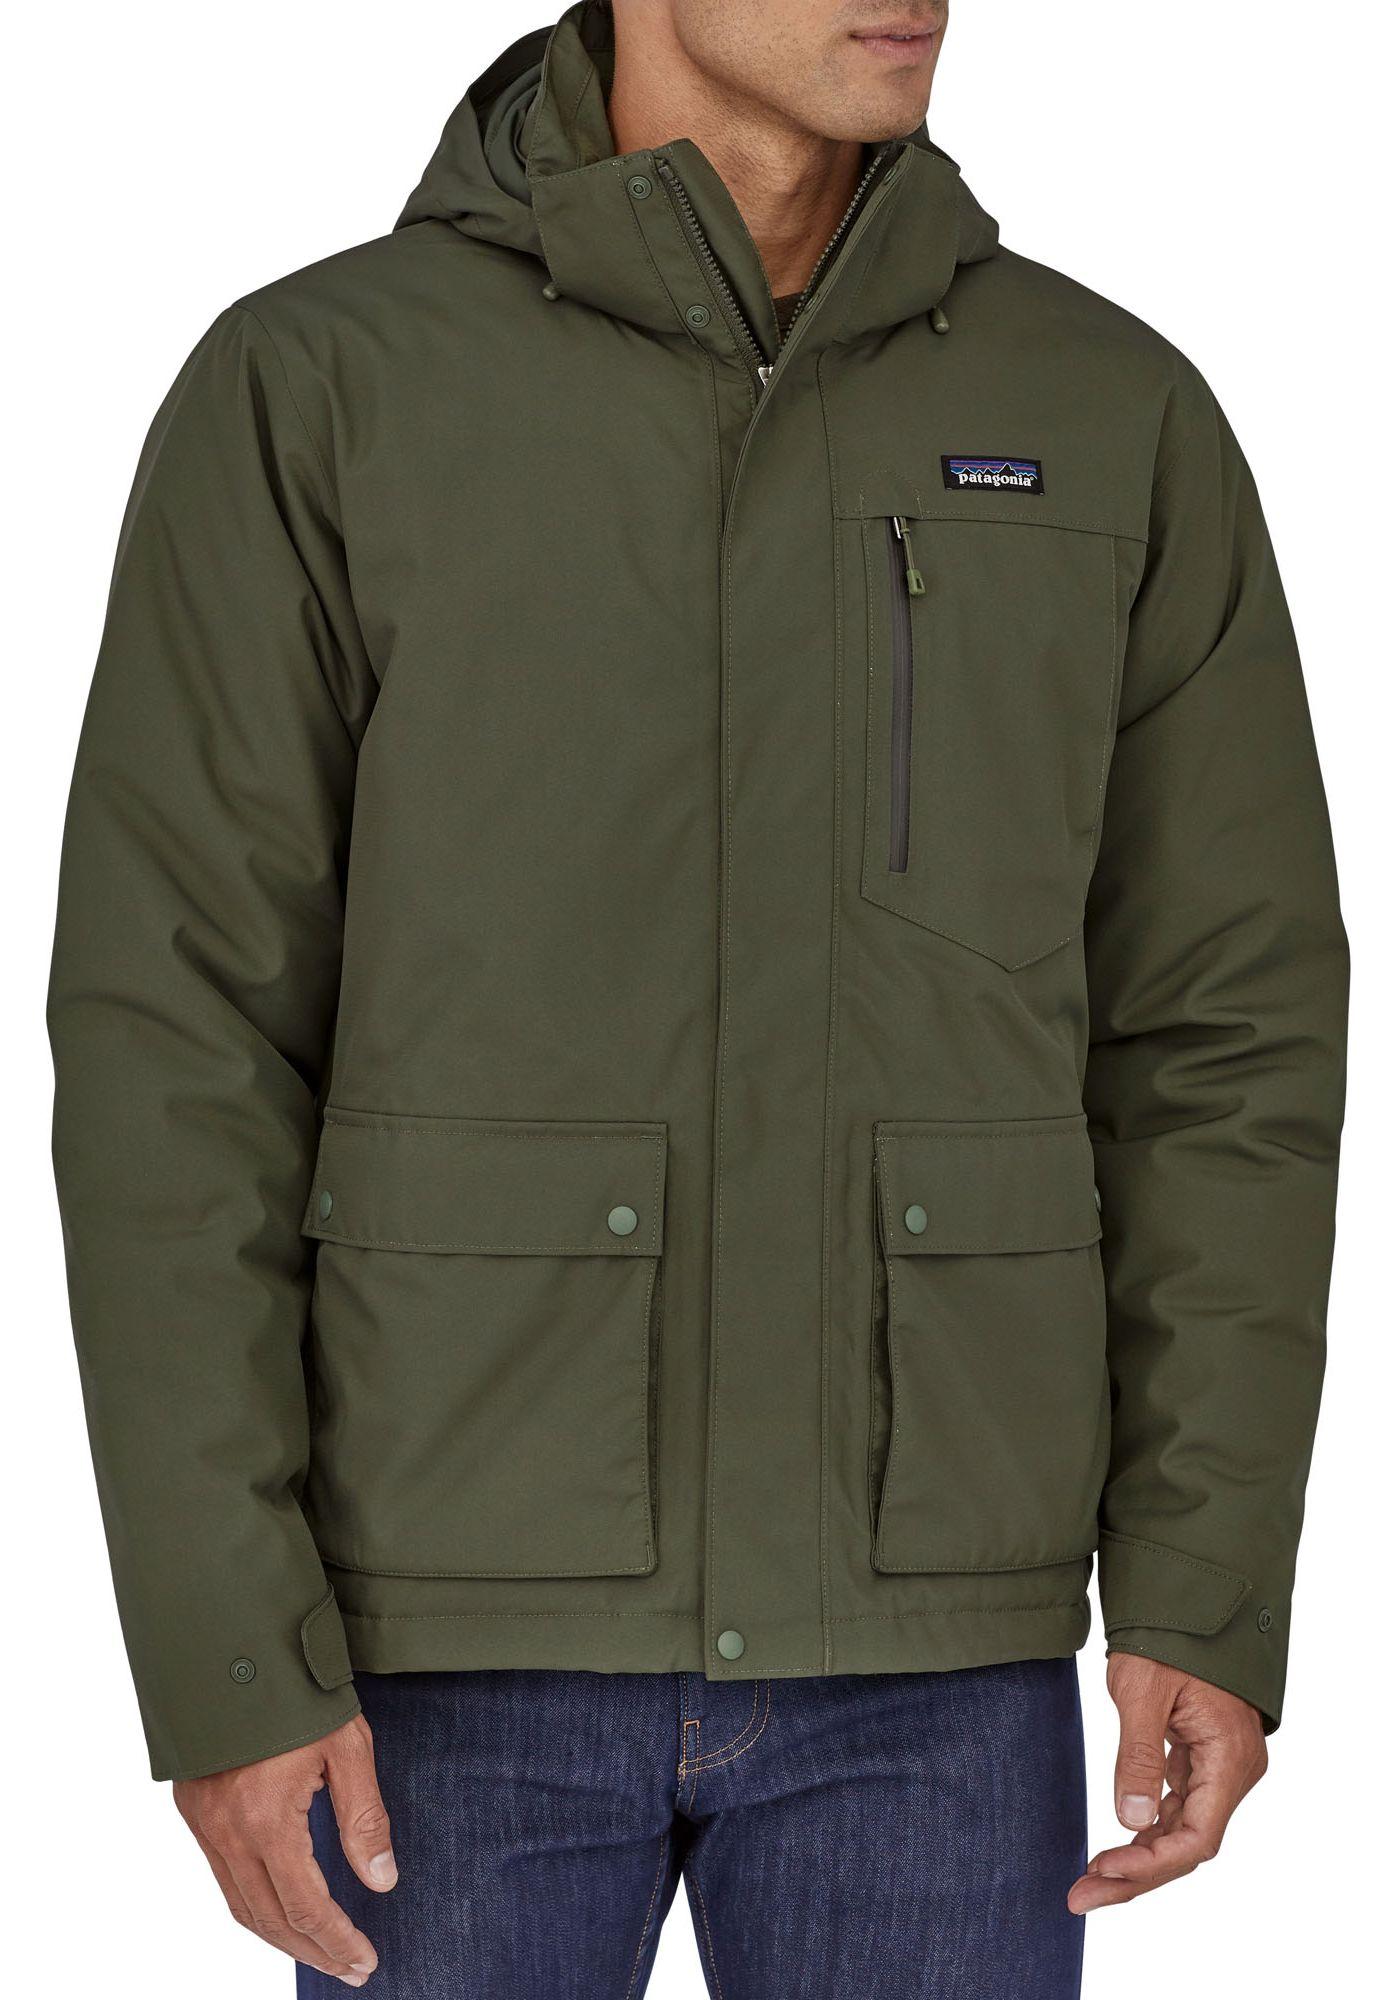 Patagonia Mens Topley Down Jacket  Dicks Sporting Goods-5739